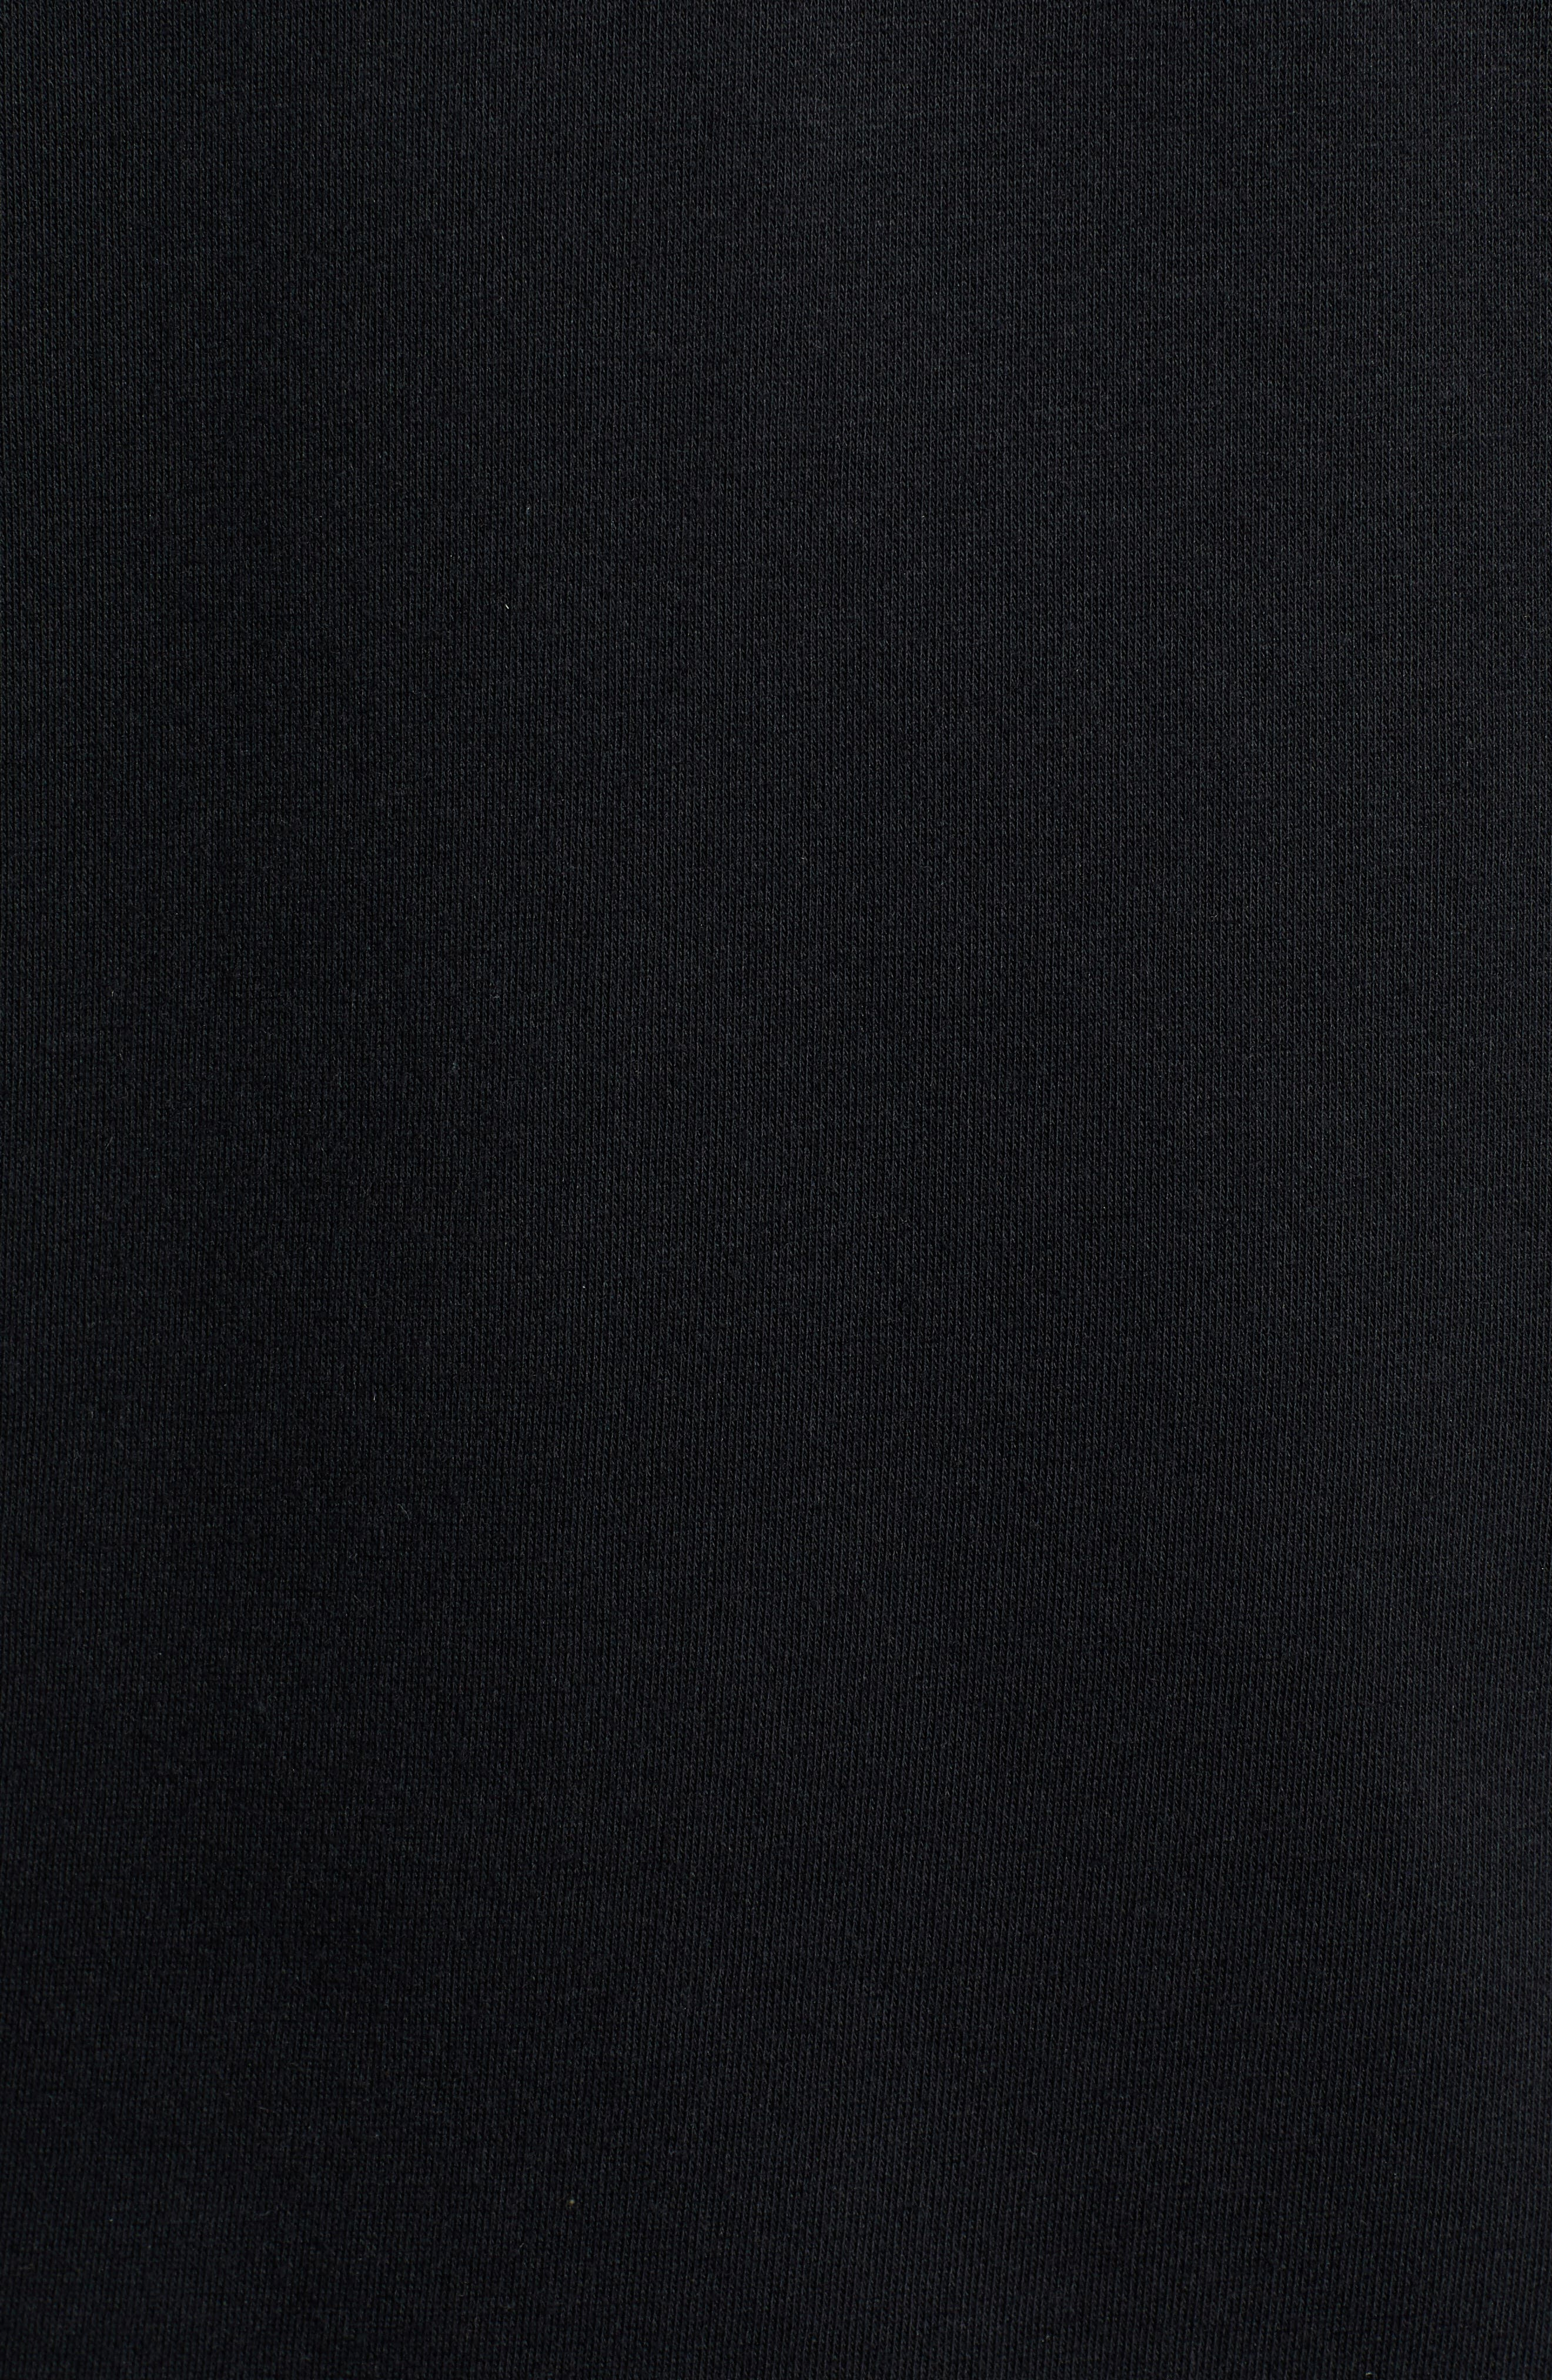 Bugasweat Crewneck Sweatshirt,                             Alternate thumbnail 5, color,                             BLACK